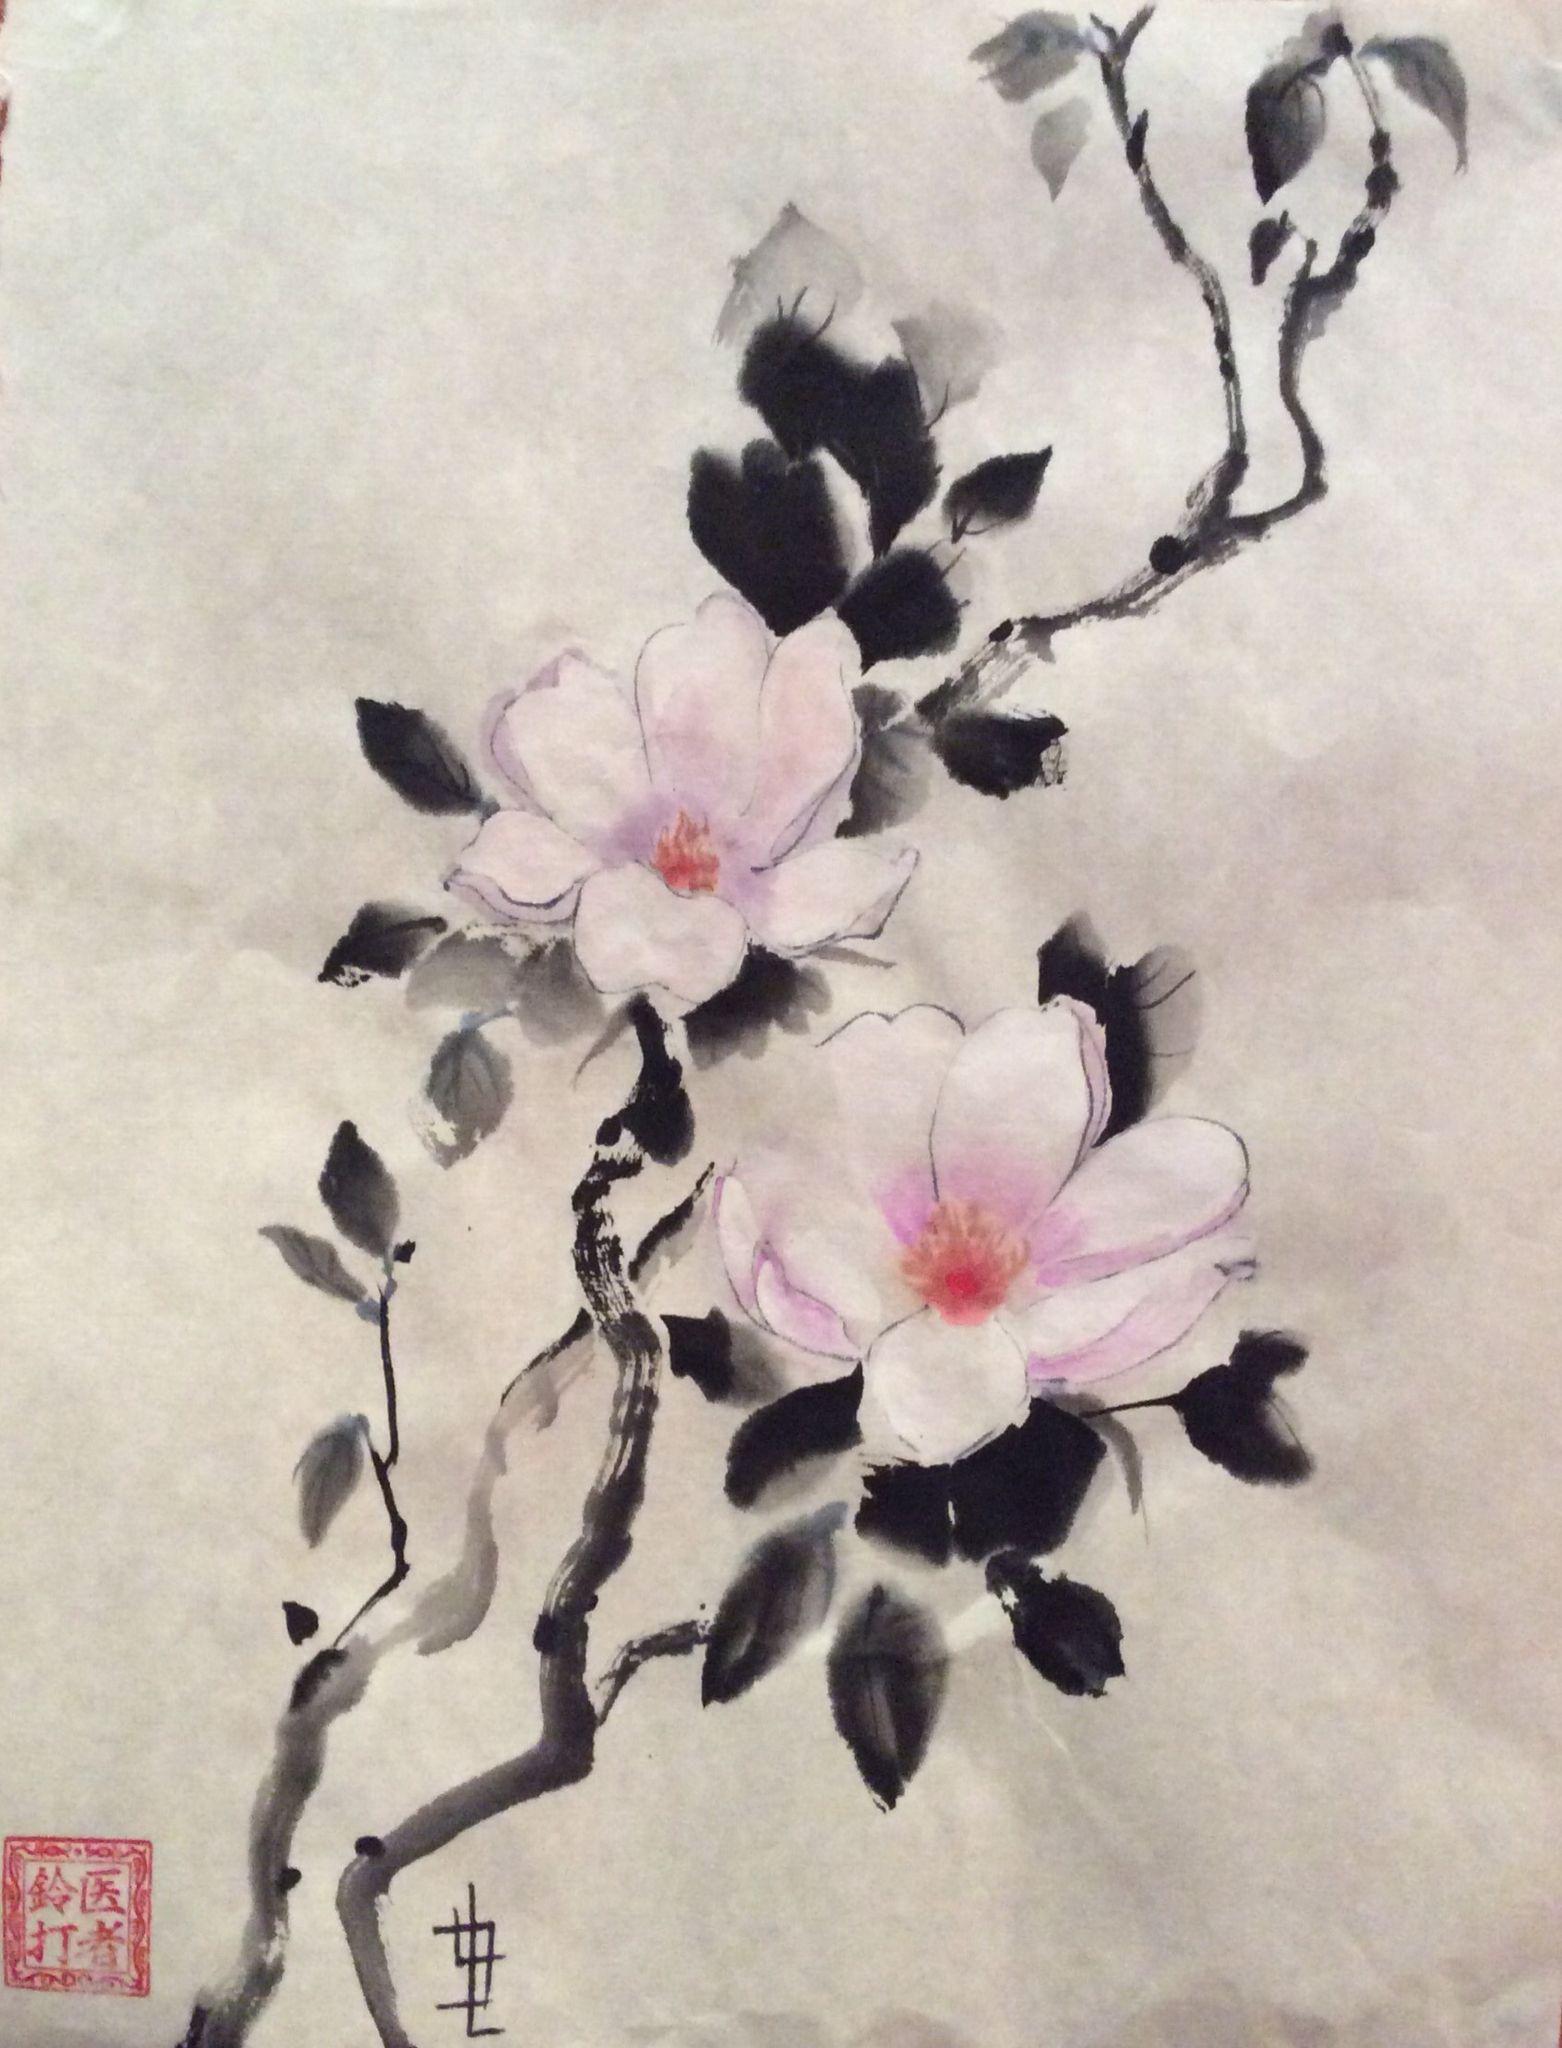 P1 2 From Man Luen Choon Magnolias Chinesepainting Asian Paints Chinese Flowers Chinese Painting